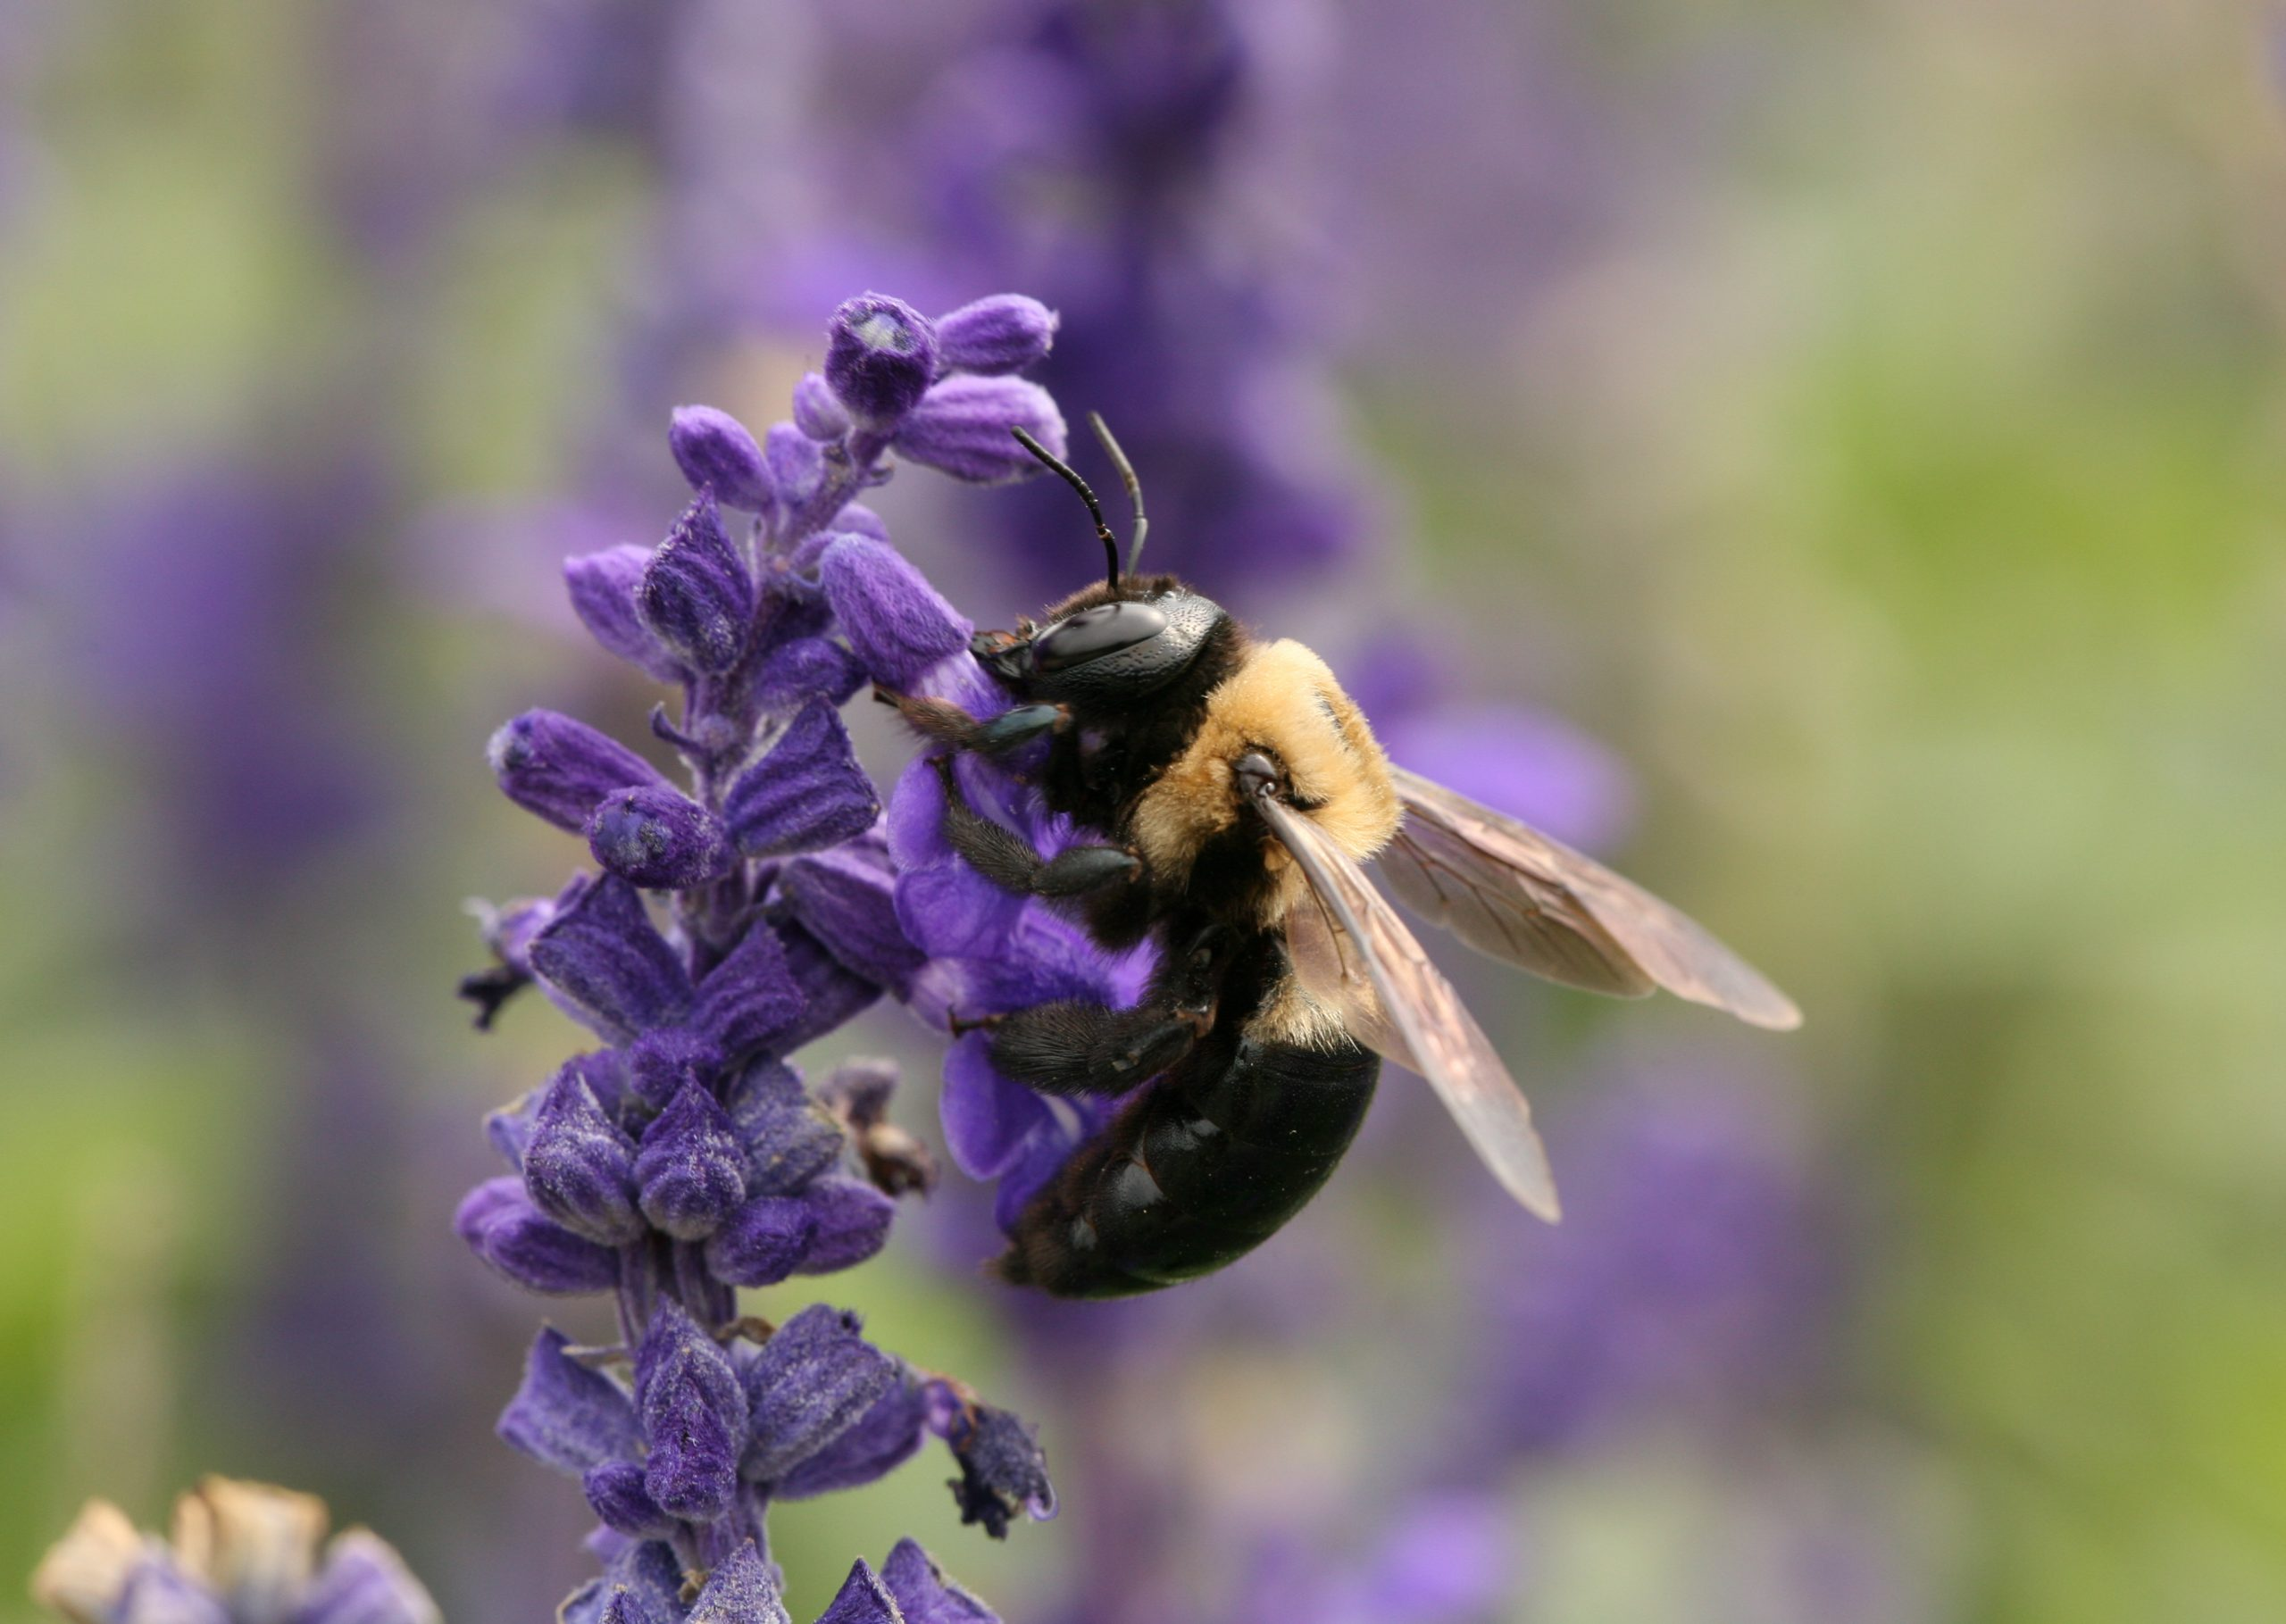 Carpenter Bee - Author Schwen, Daniel - From Wikipedia Creative Commons Attribution-Share Alike 4.0 International License